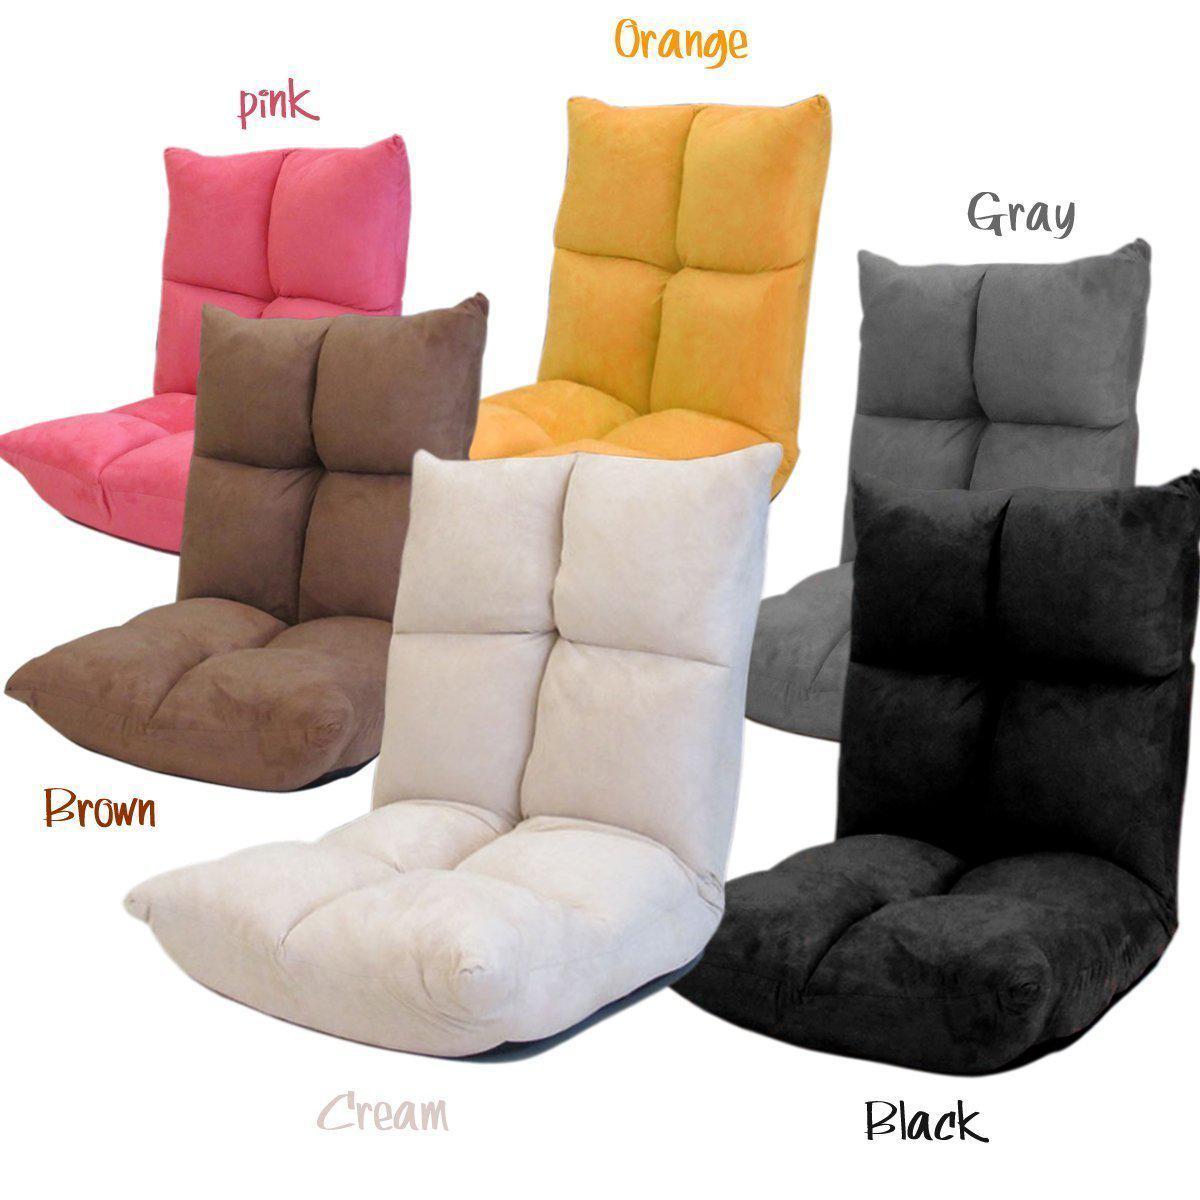 Großhandel Klappstühle, Sofa Set, Ledersofa, Lounge Sofa Stühle ...